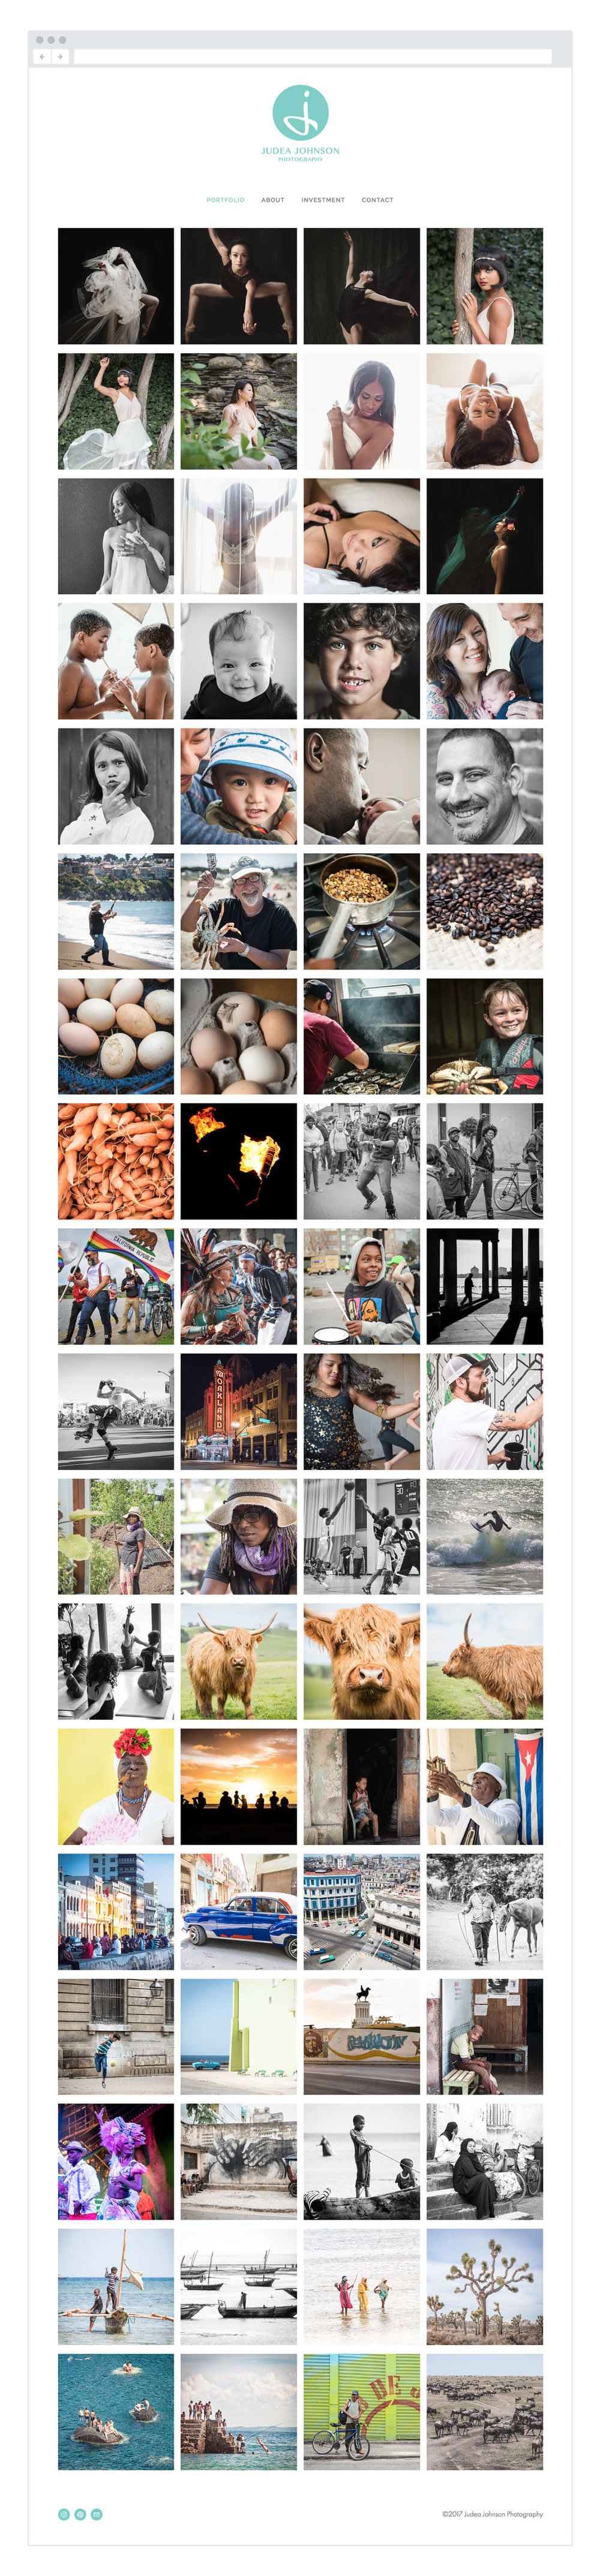 Judea-Johnson-Photography-portfolio-page-branding-webdesign